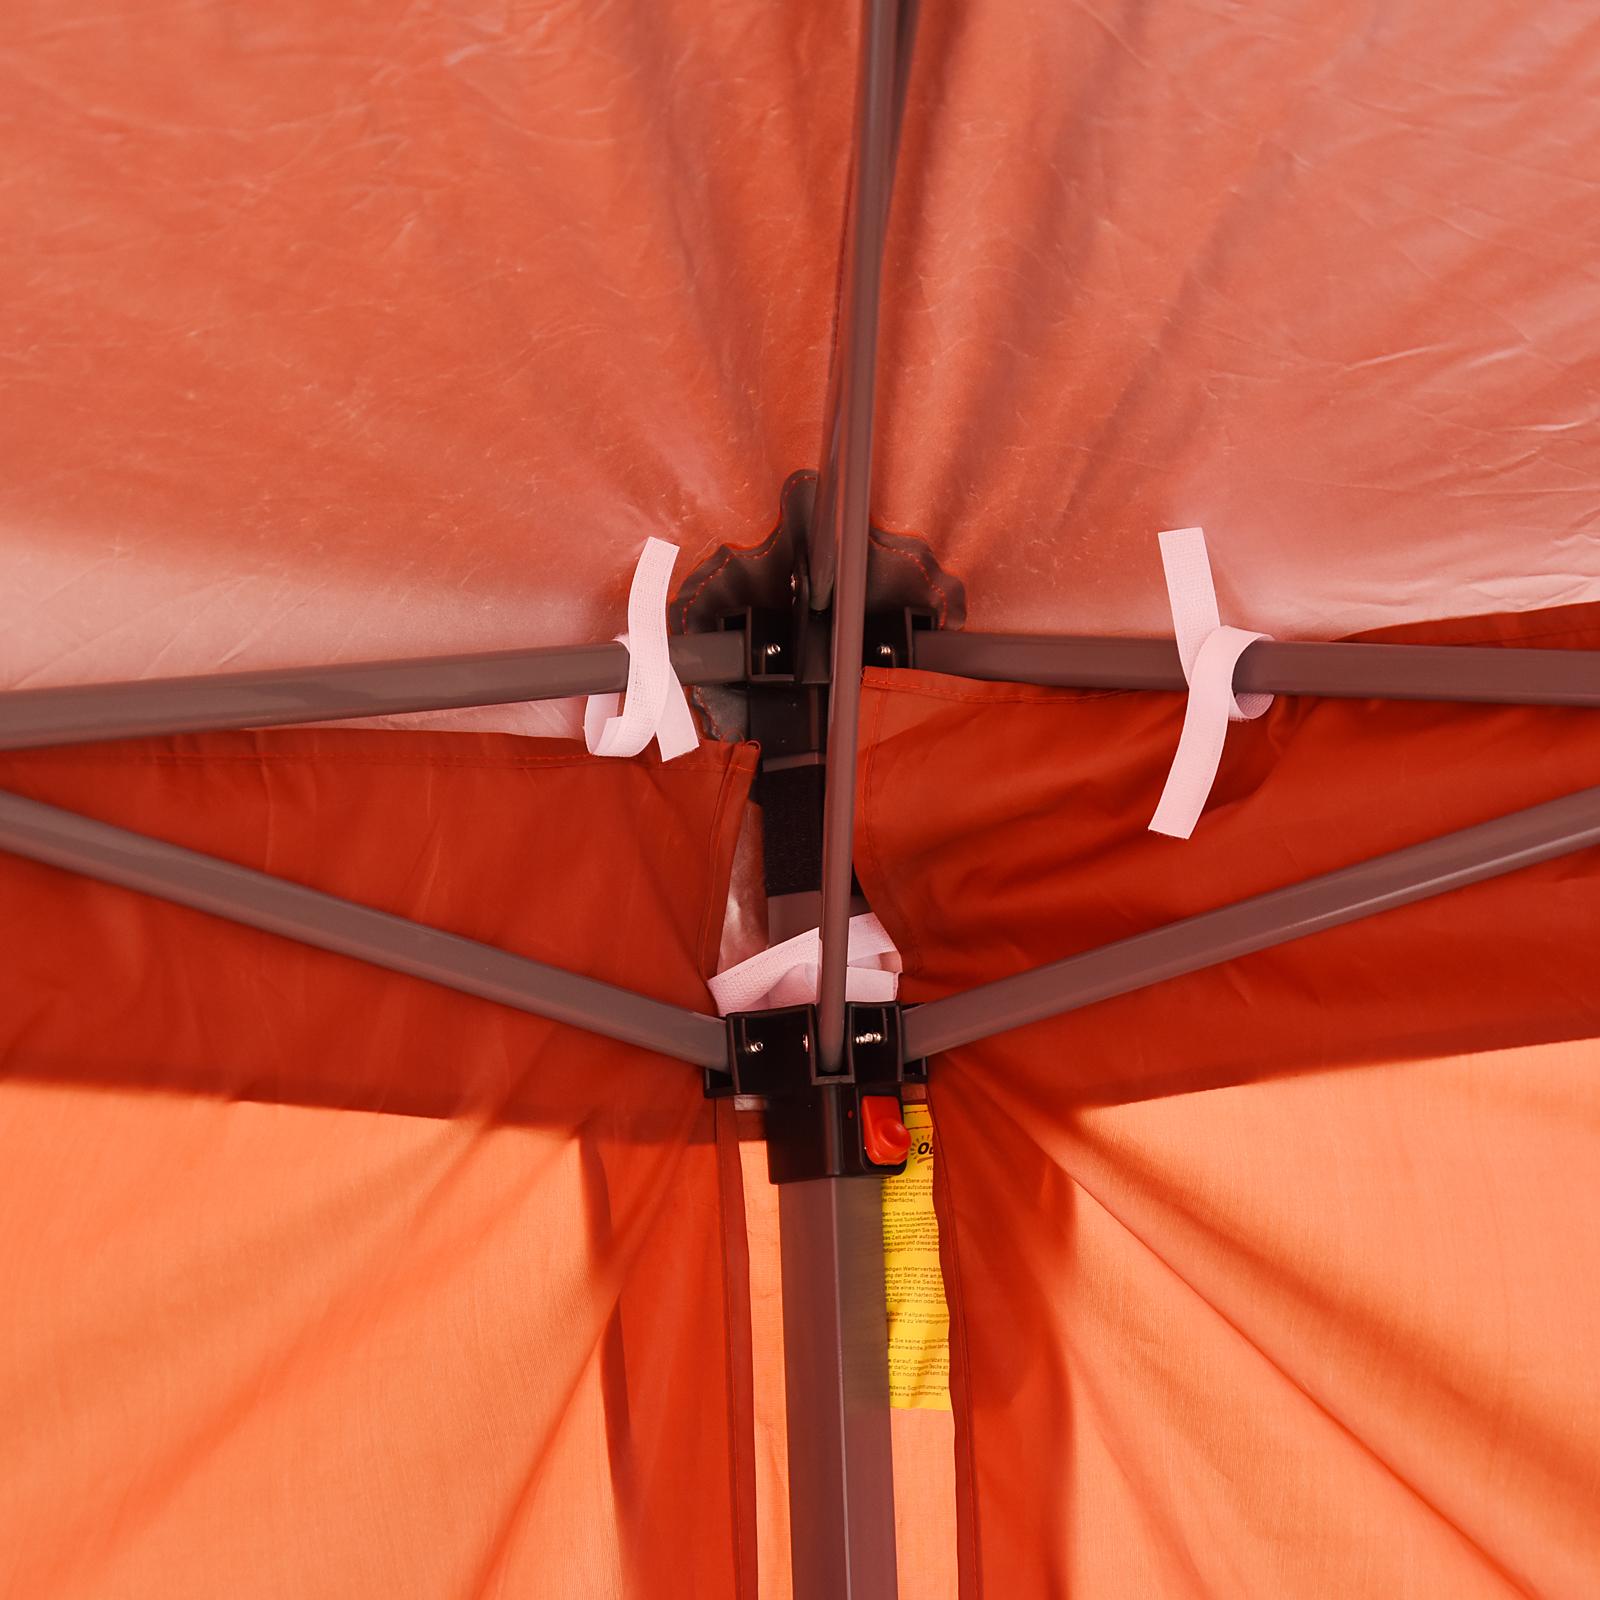 Outdoor-10-039-x20-039-EZ-POP-UP-Gazebo-Wedding-Party-Tent-Canopy-Folding-w-Carry-Bag thumbnail 39